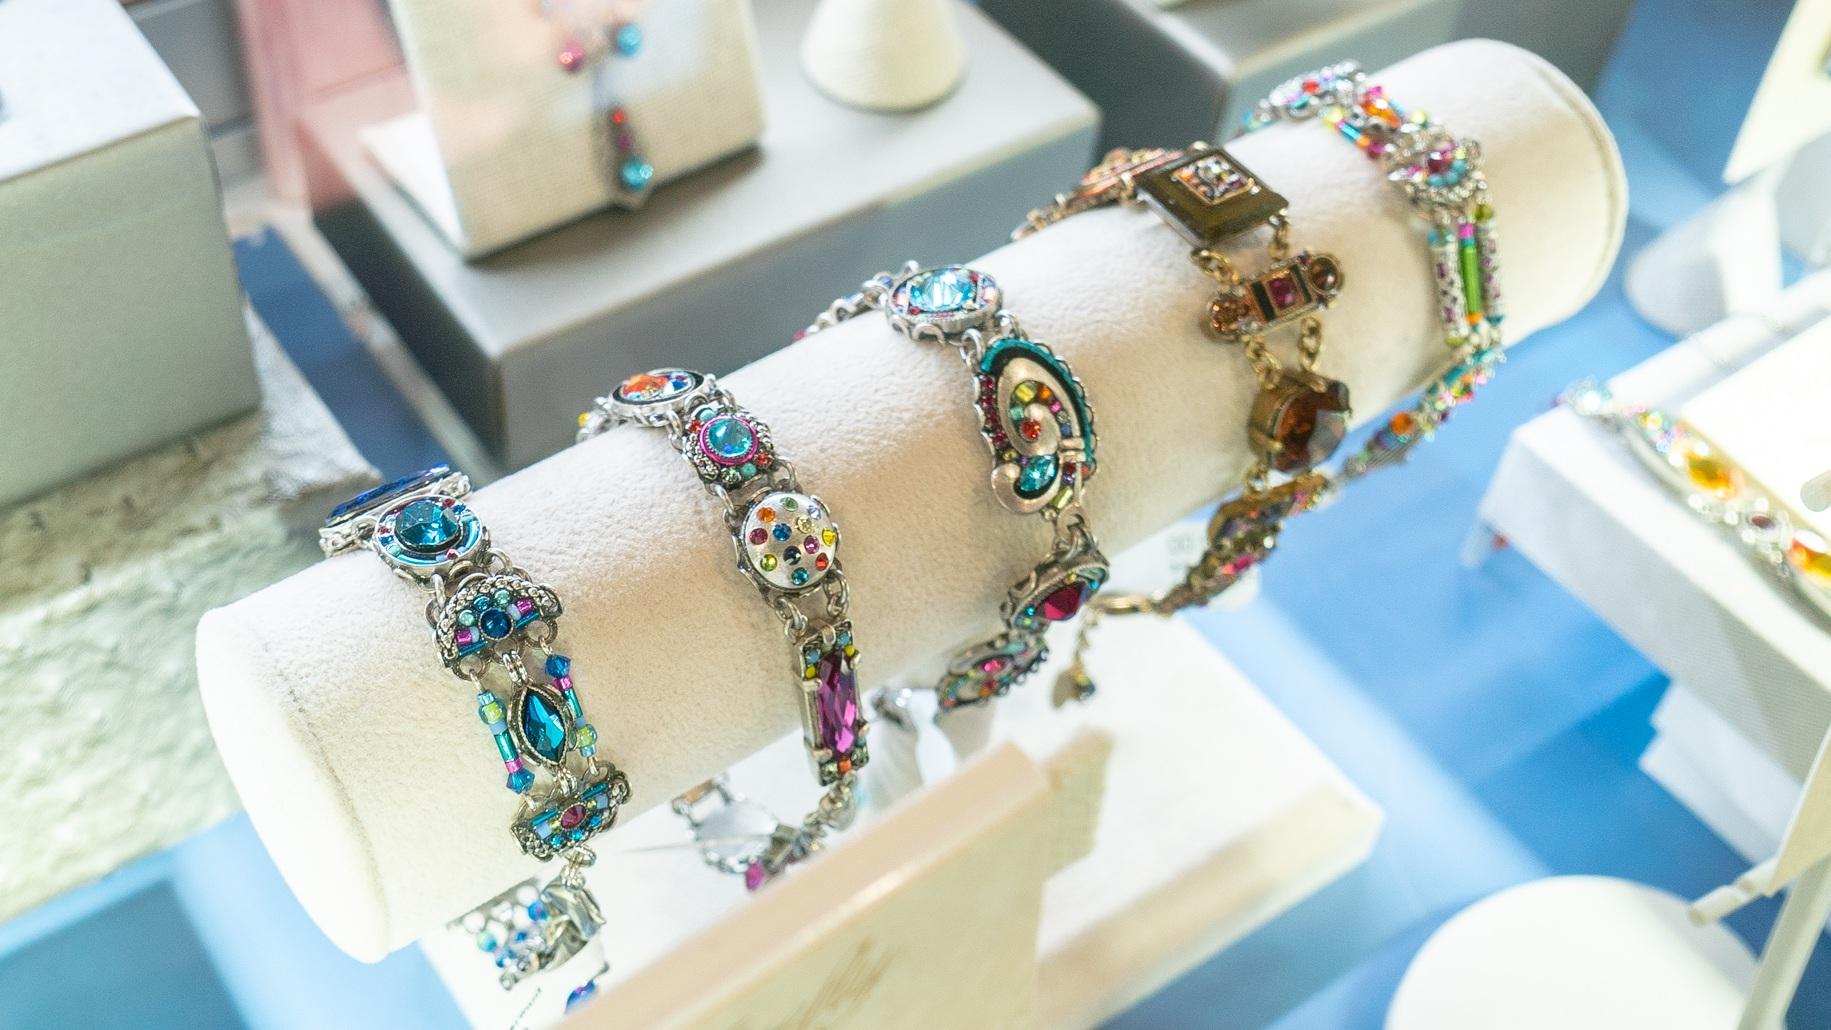 Firefly Mosaic Jewelry